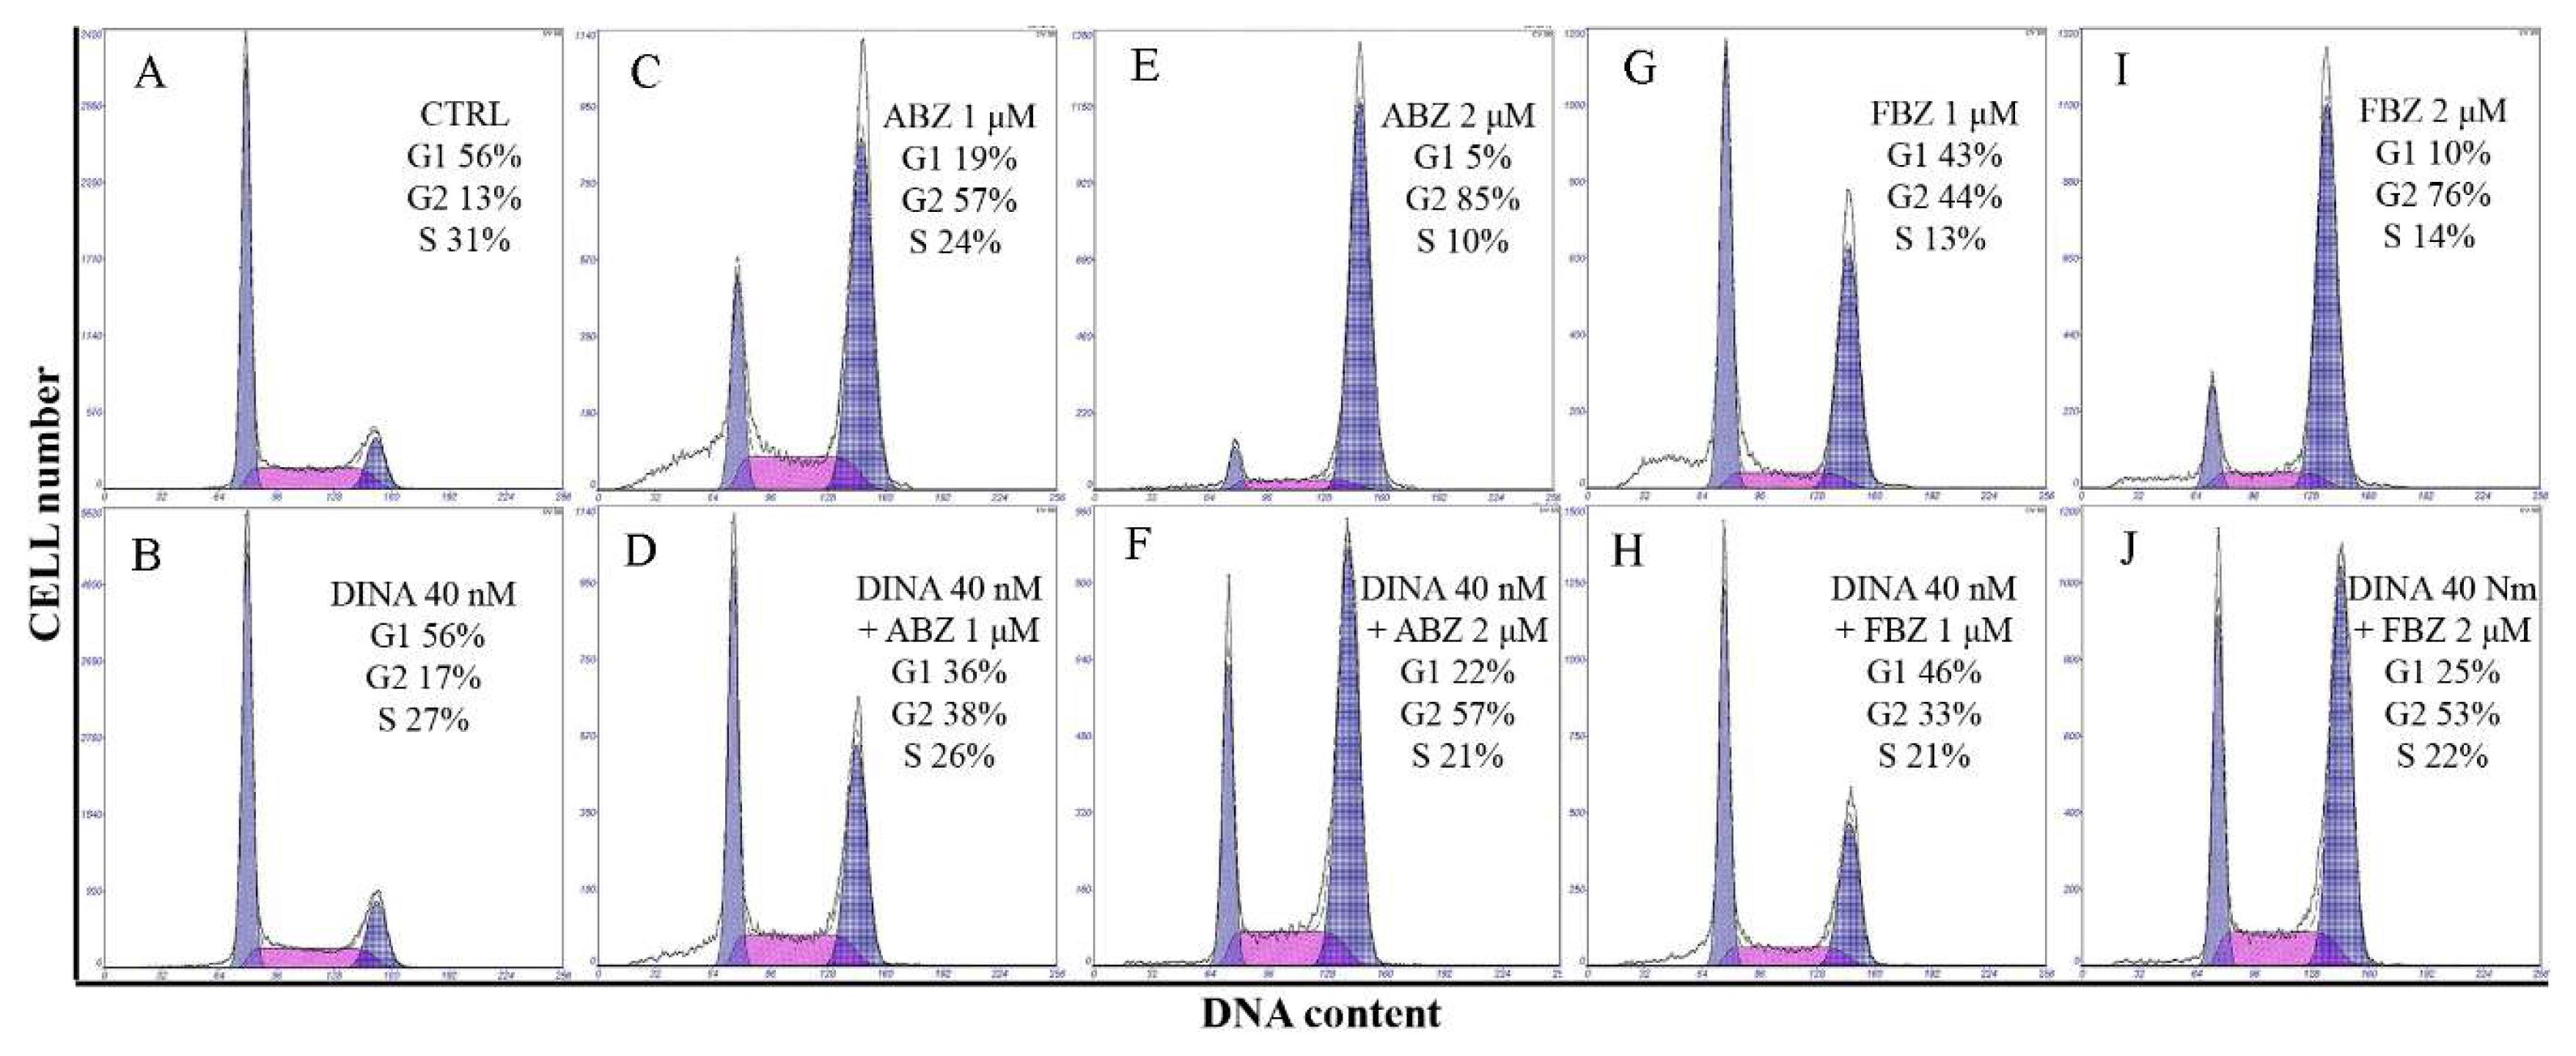 Molecules | Free Full-Text | Benzimidazoles Downregulate Mdm2 and